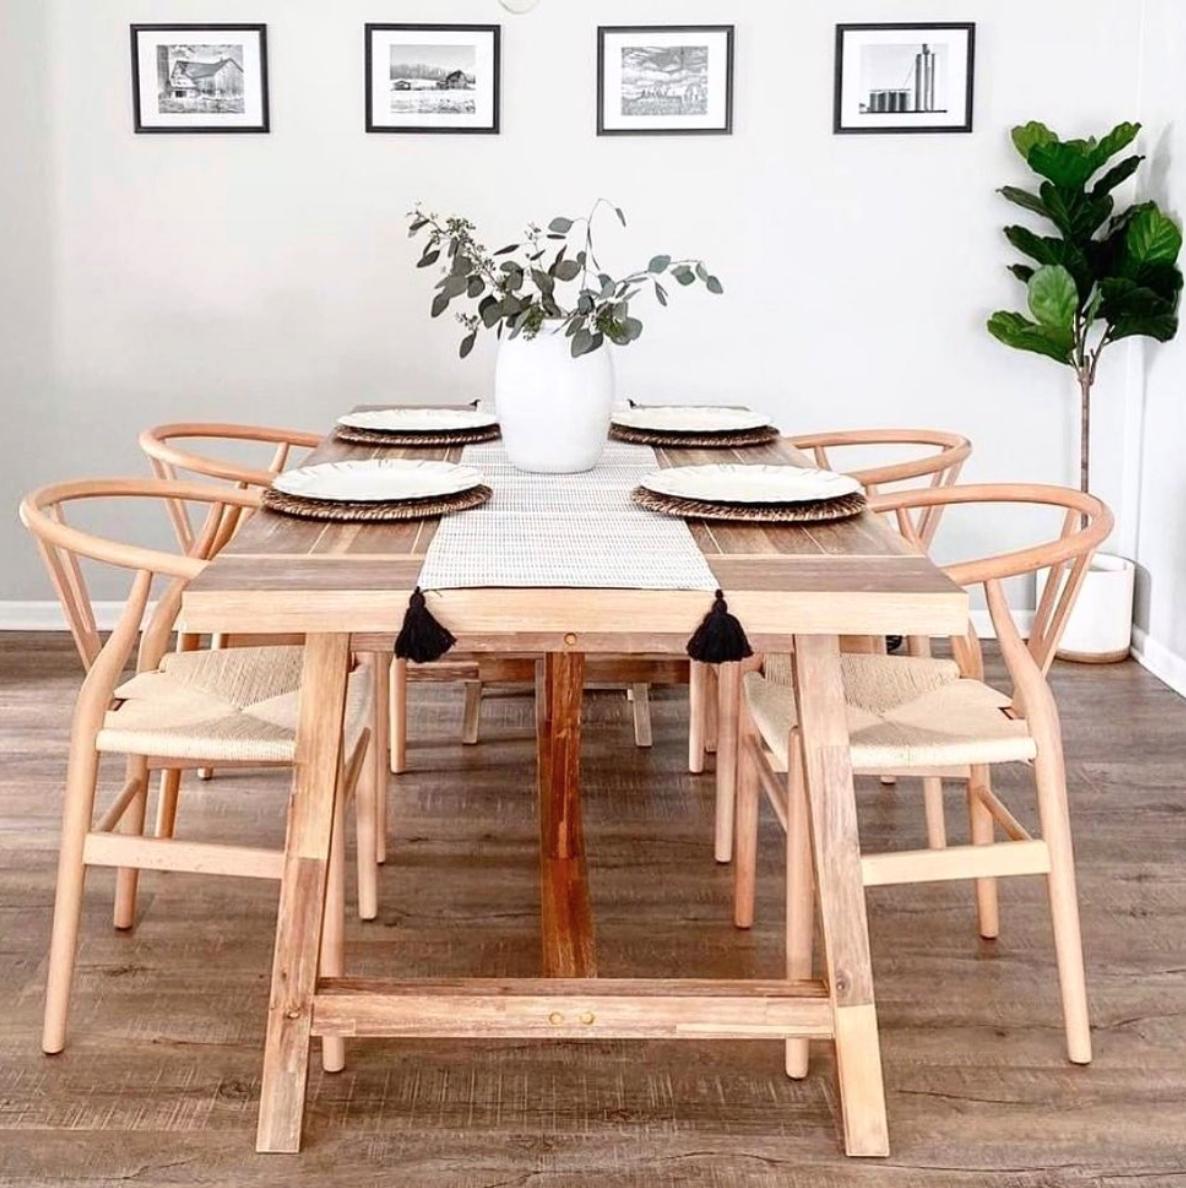 ahsap iskandinav sandalye wood scandinavian chair luks mutfaklar ev duzenleme sandalye